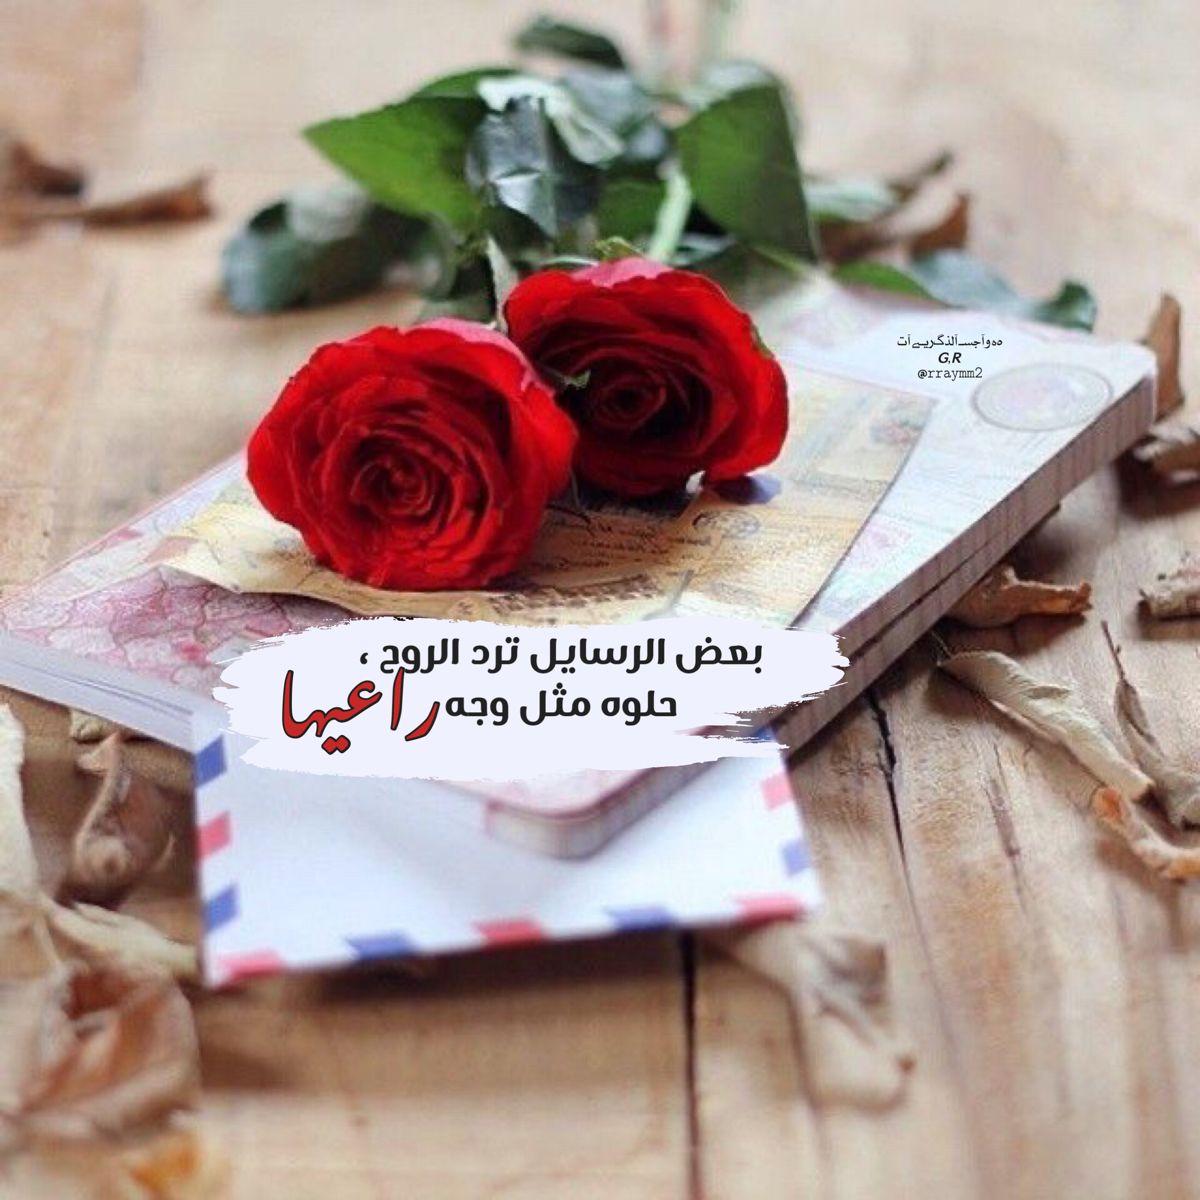 Pin By هہ وآجسـ آلذگريـﮯآت 𝙂 𝙍 On G R In 2021 Red Roses Beautiful Roses Drying Roses